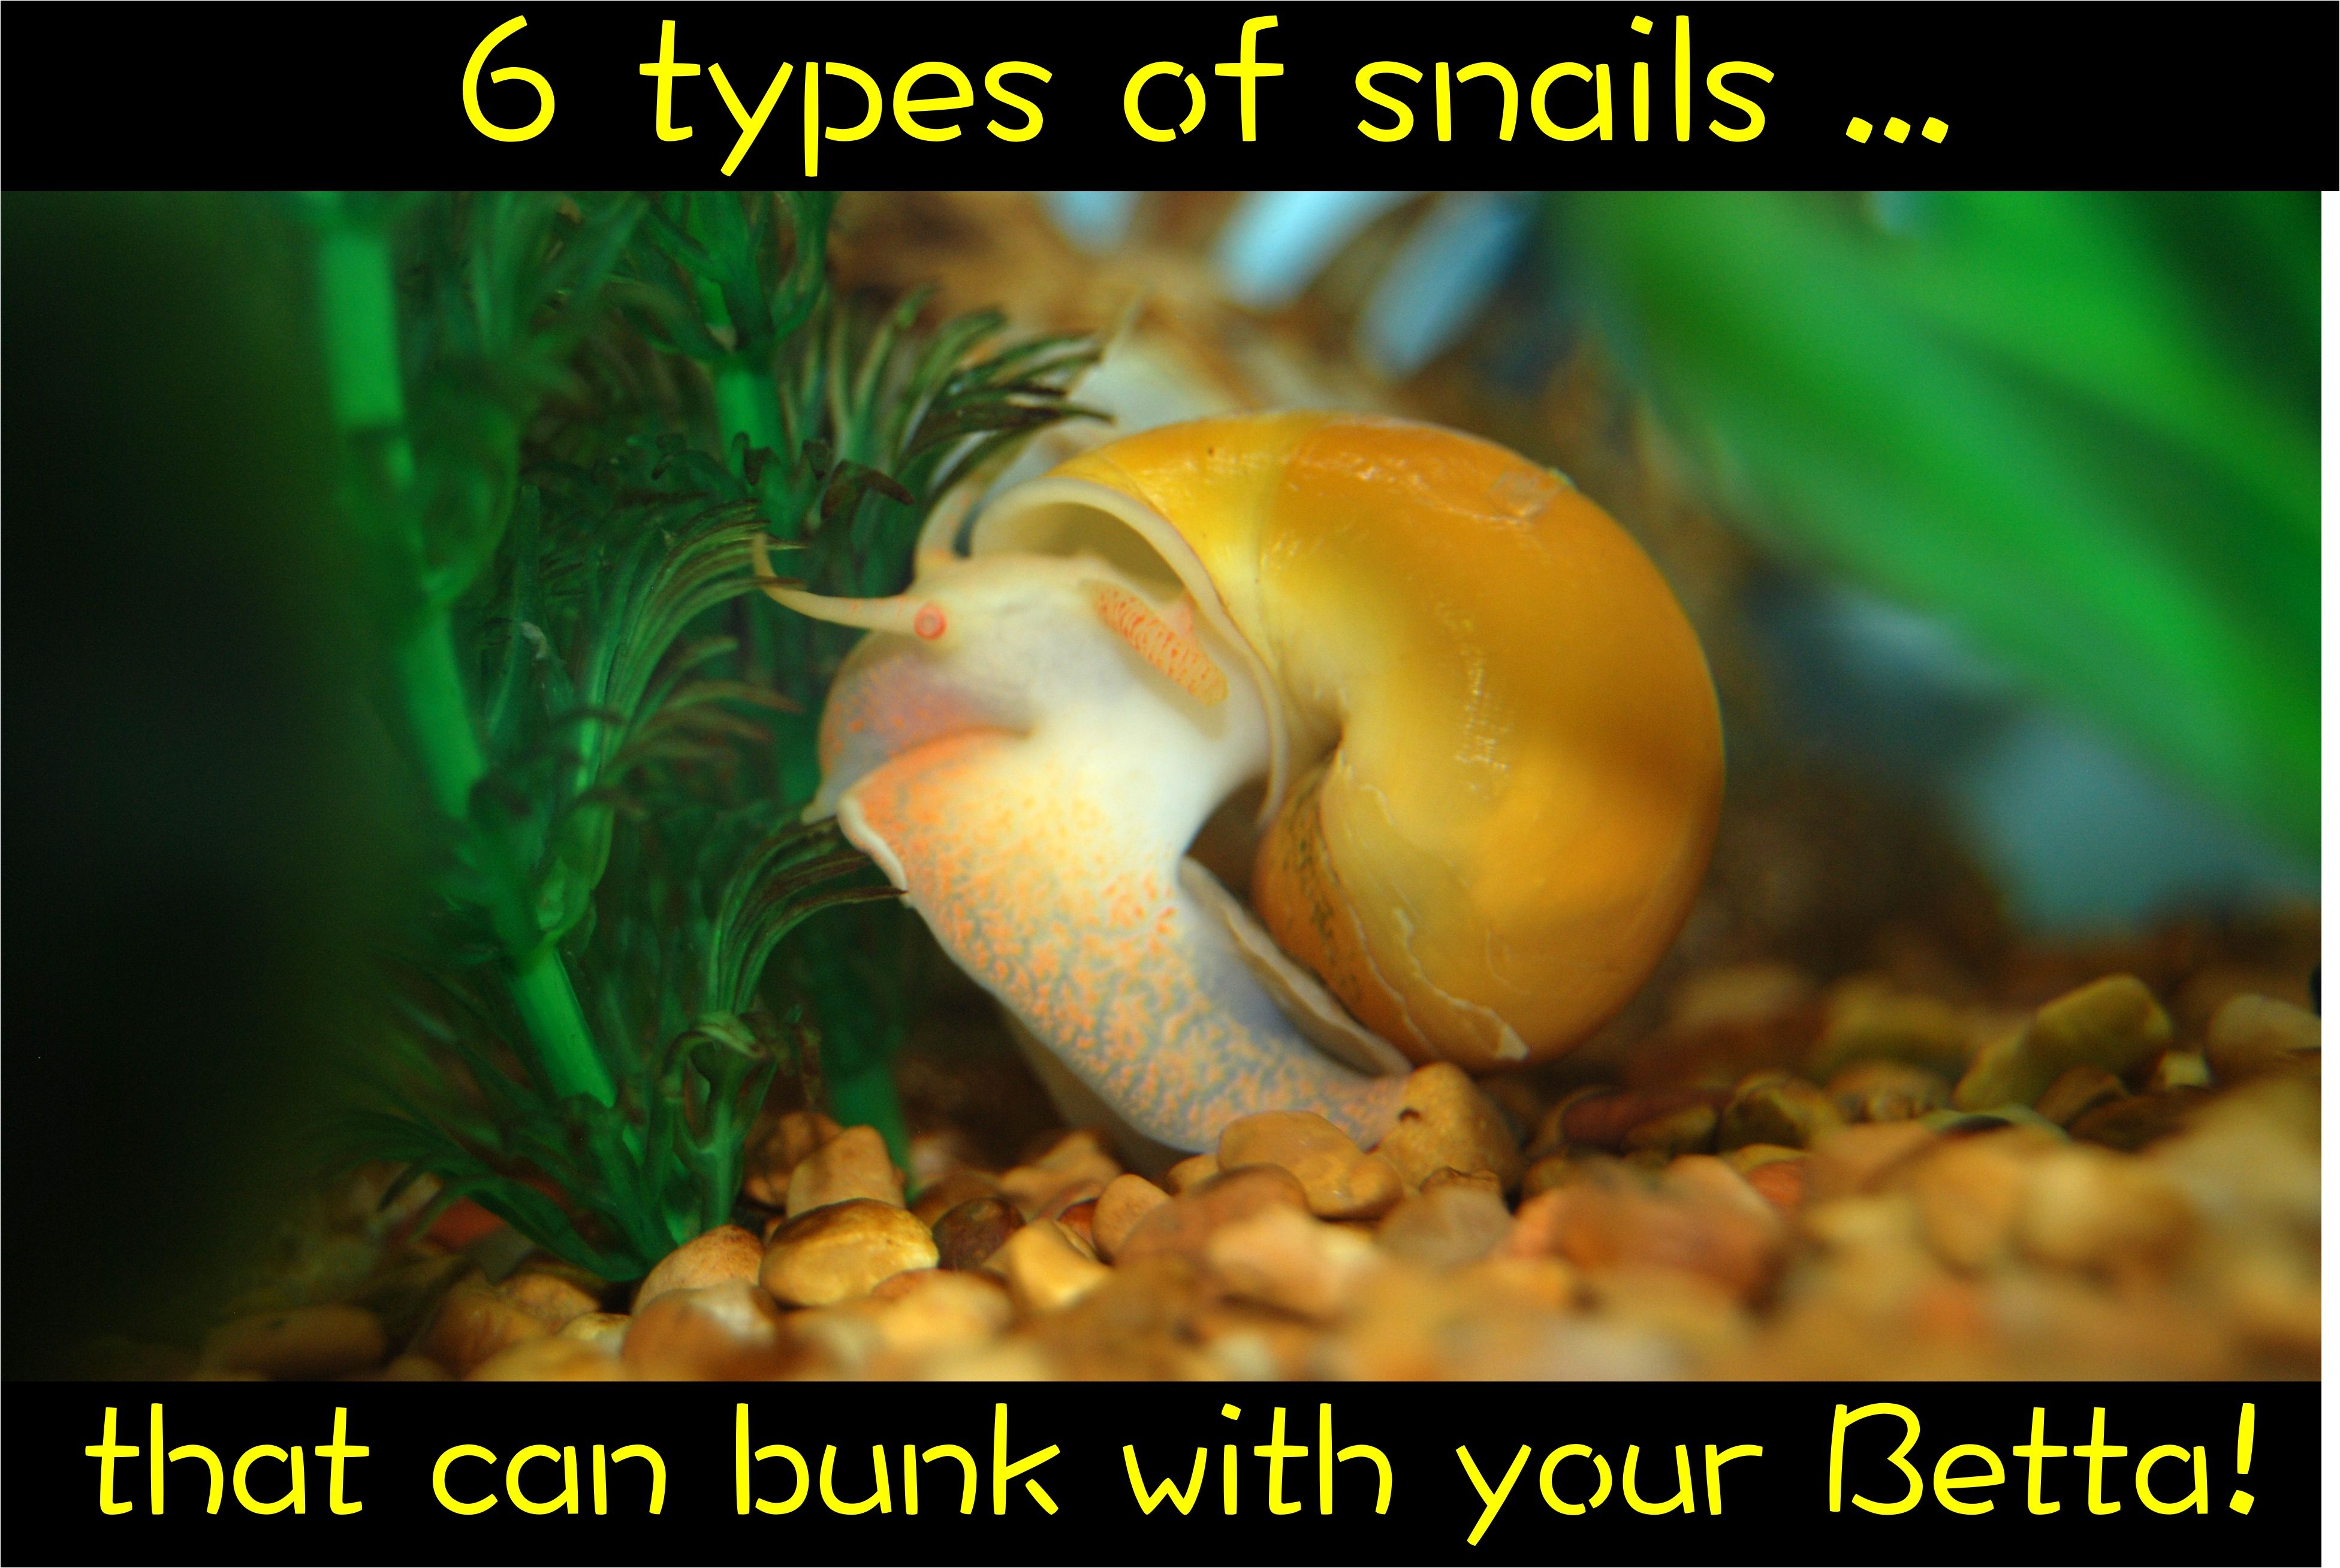 6 Types Of Snails That Can Bunk With Your Betta Betta Fish Tank Betta Fish Betta